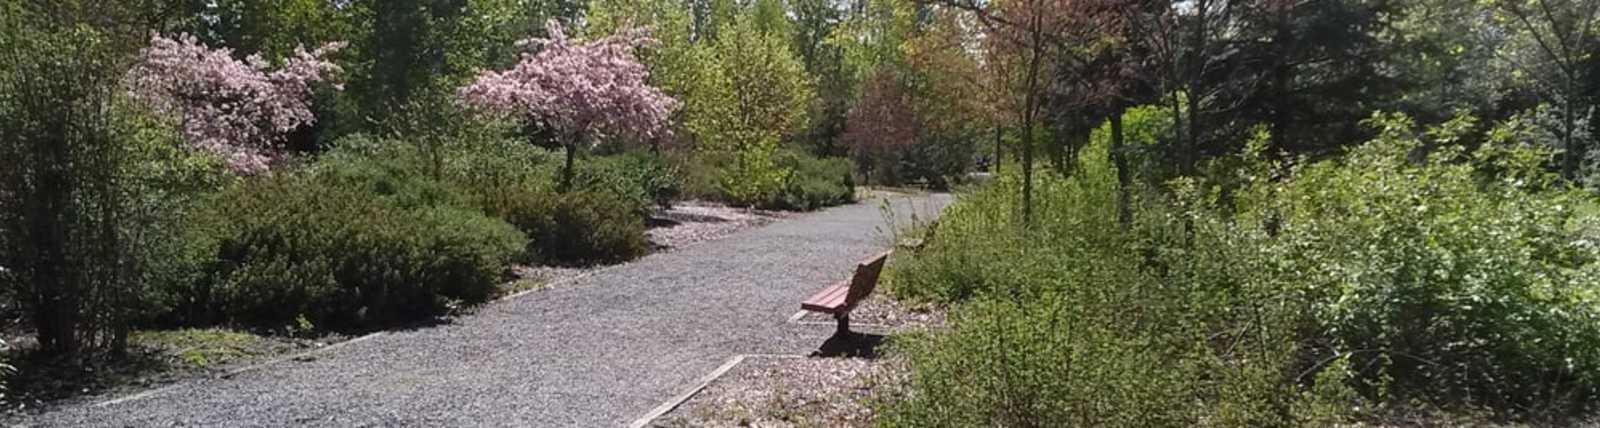 Tukwila Pond Park